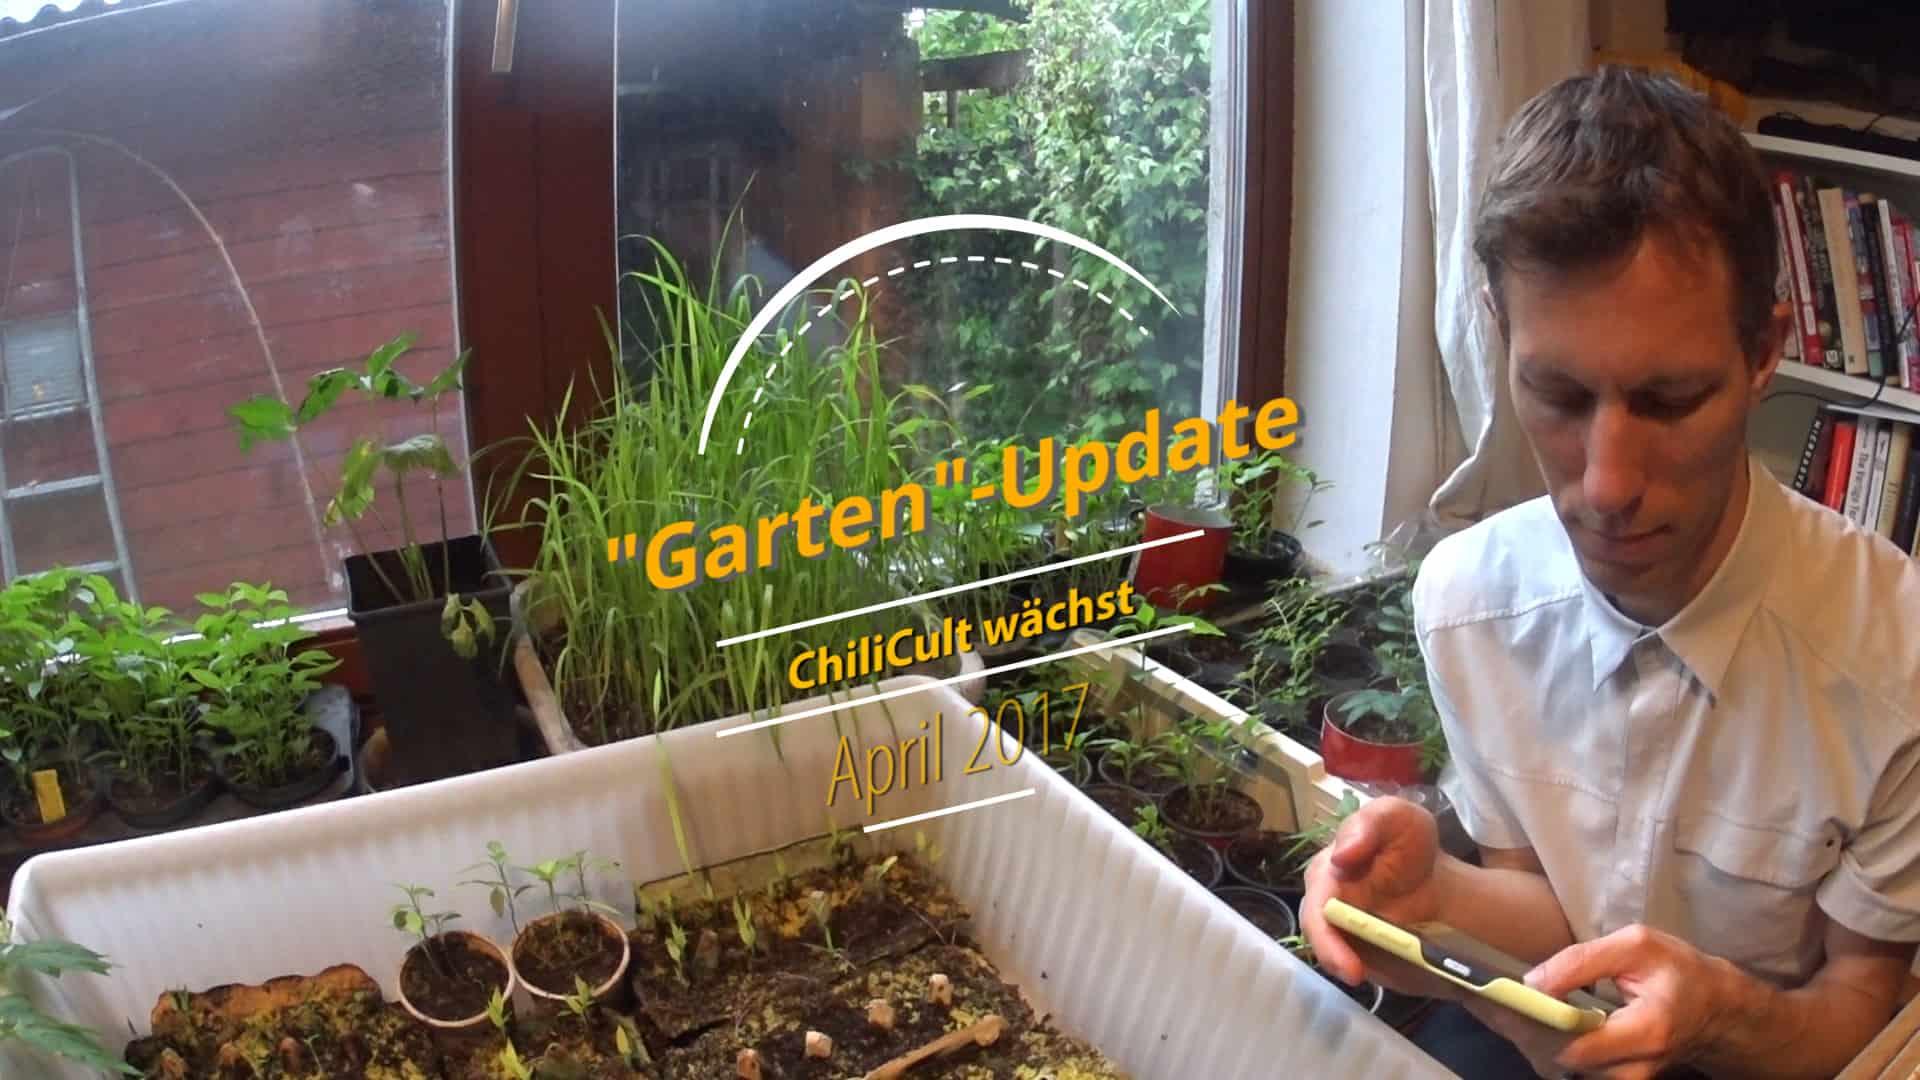 Garten Update, April 2017